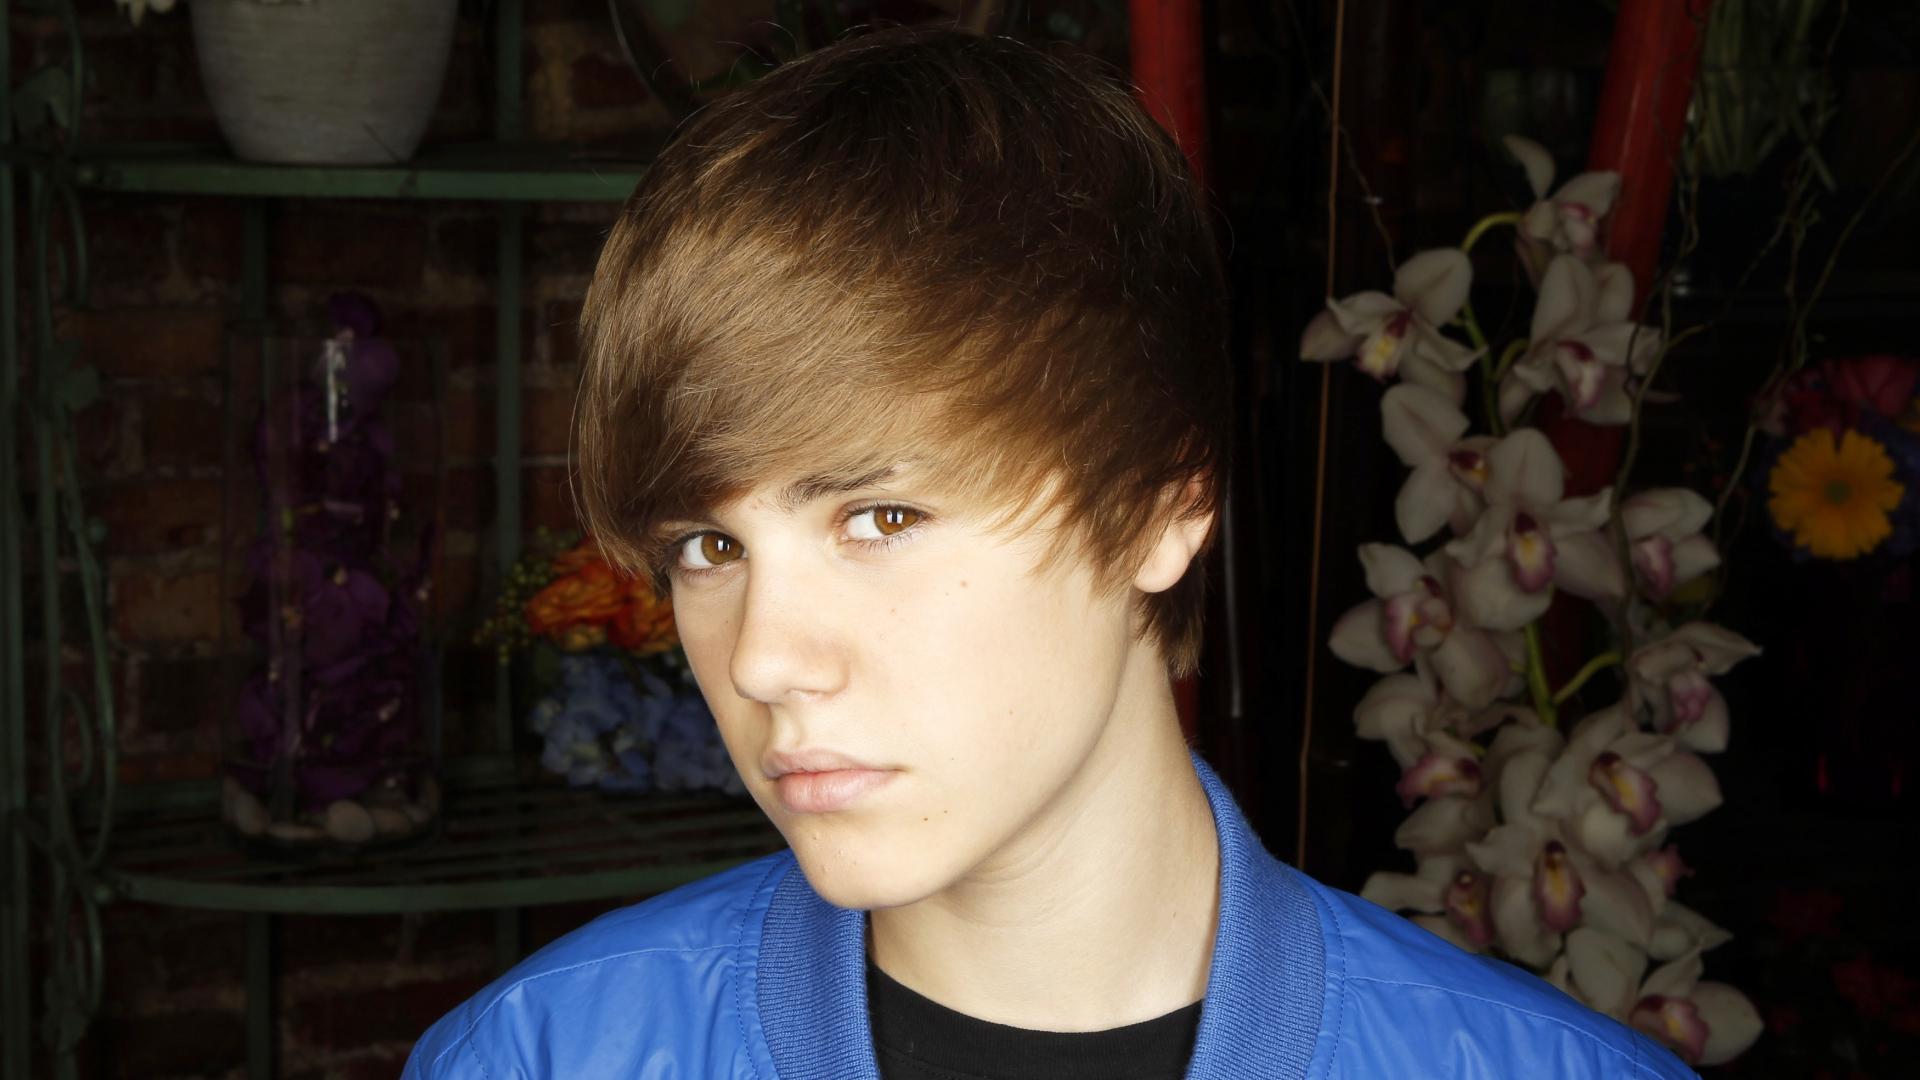 Lonely Girl Hd Wallpapers 1080p Fondos De Justin Bieber Wallpapers Y Fotos De Justin Bieber